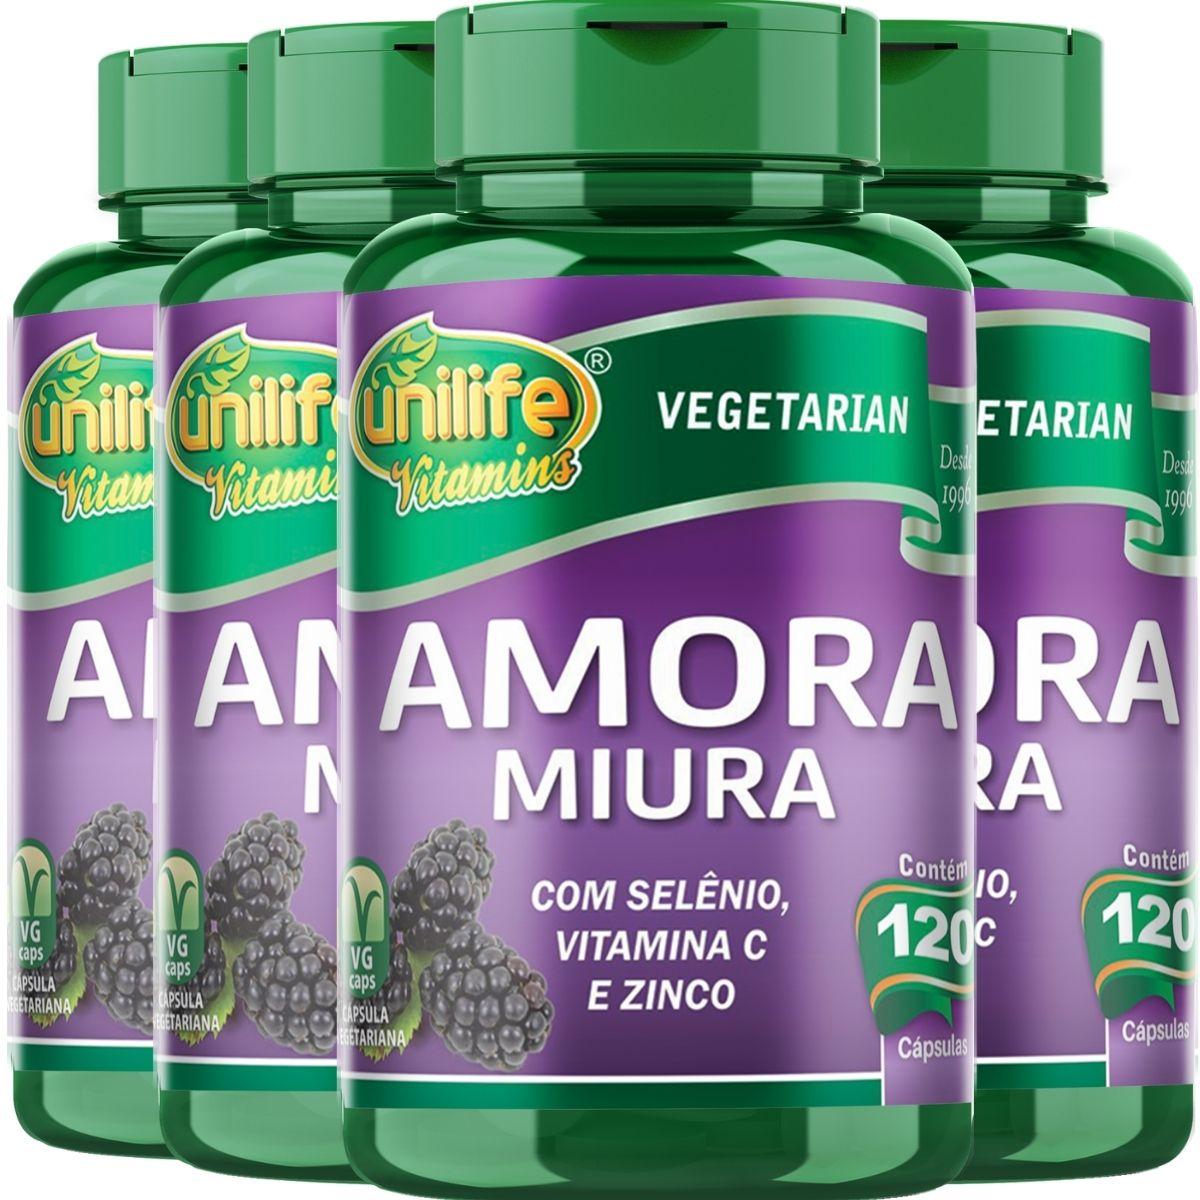 4x Amora Miura Total 480 Cápsulas - Unilife Vitamins